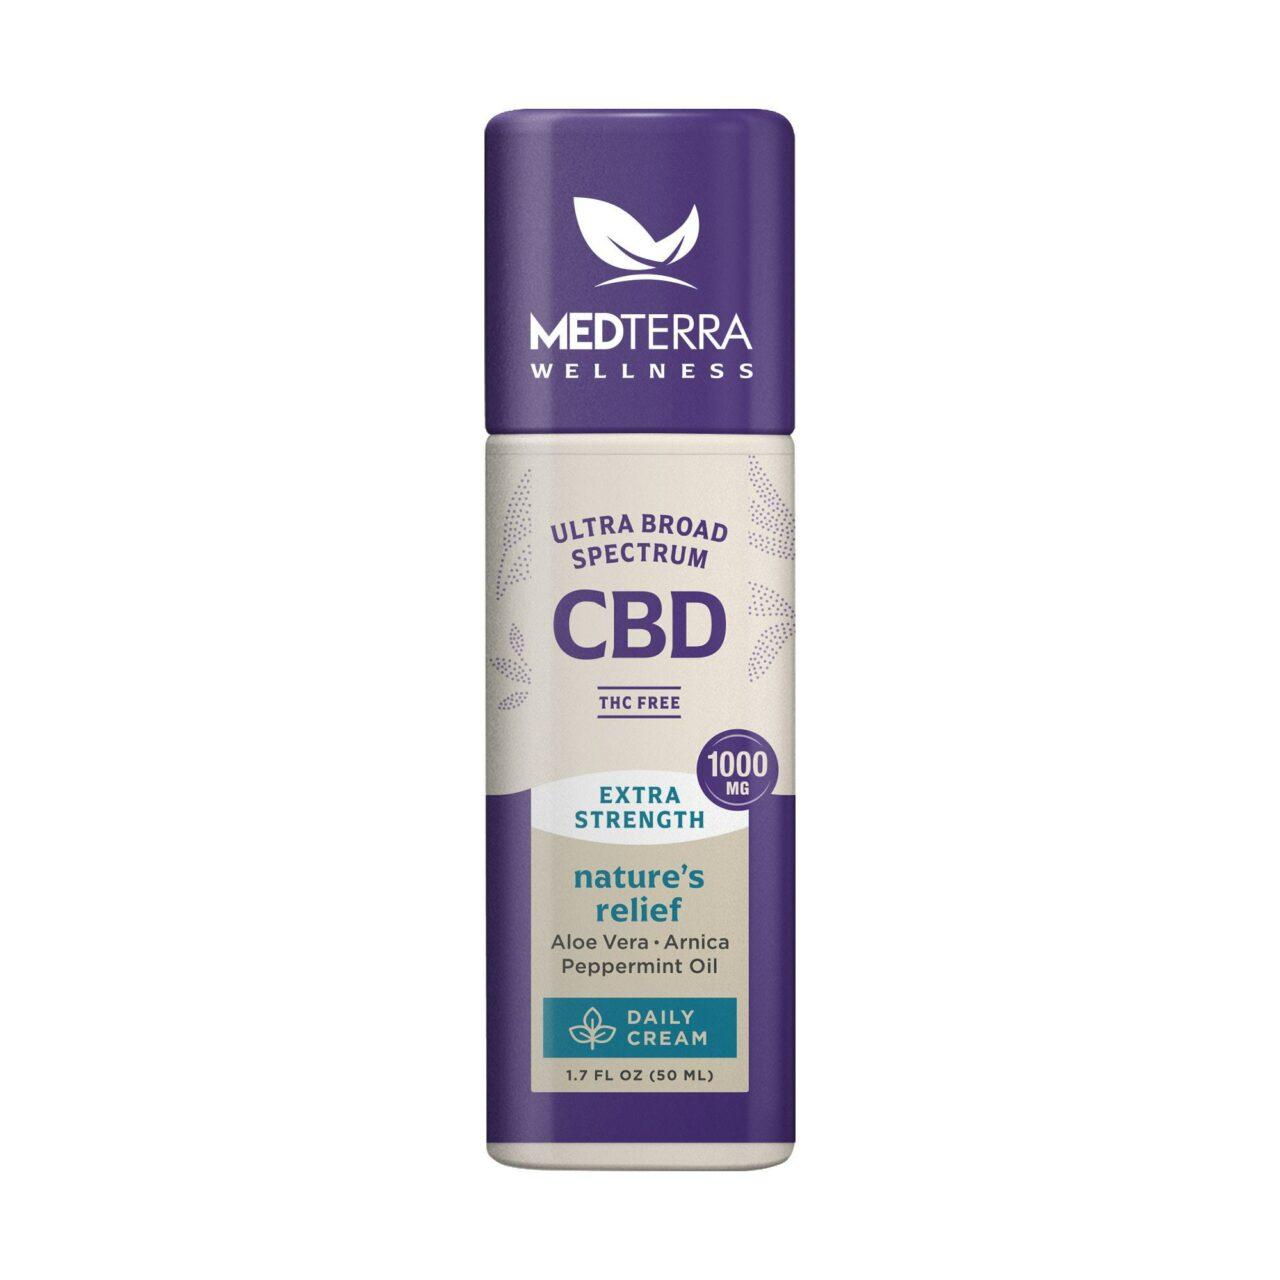 Medterra, Wellness Nature's Relief Daily CBD Cream, Broad Spectrum THC-Free, 1.7oz, 1000mg CBD 1